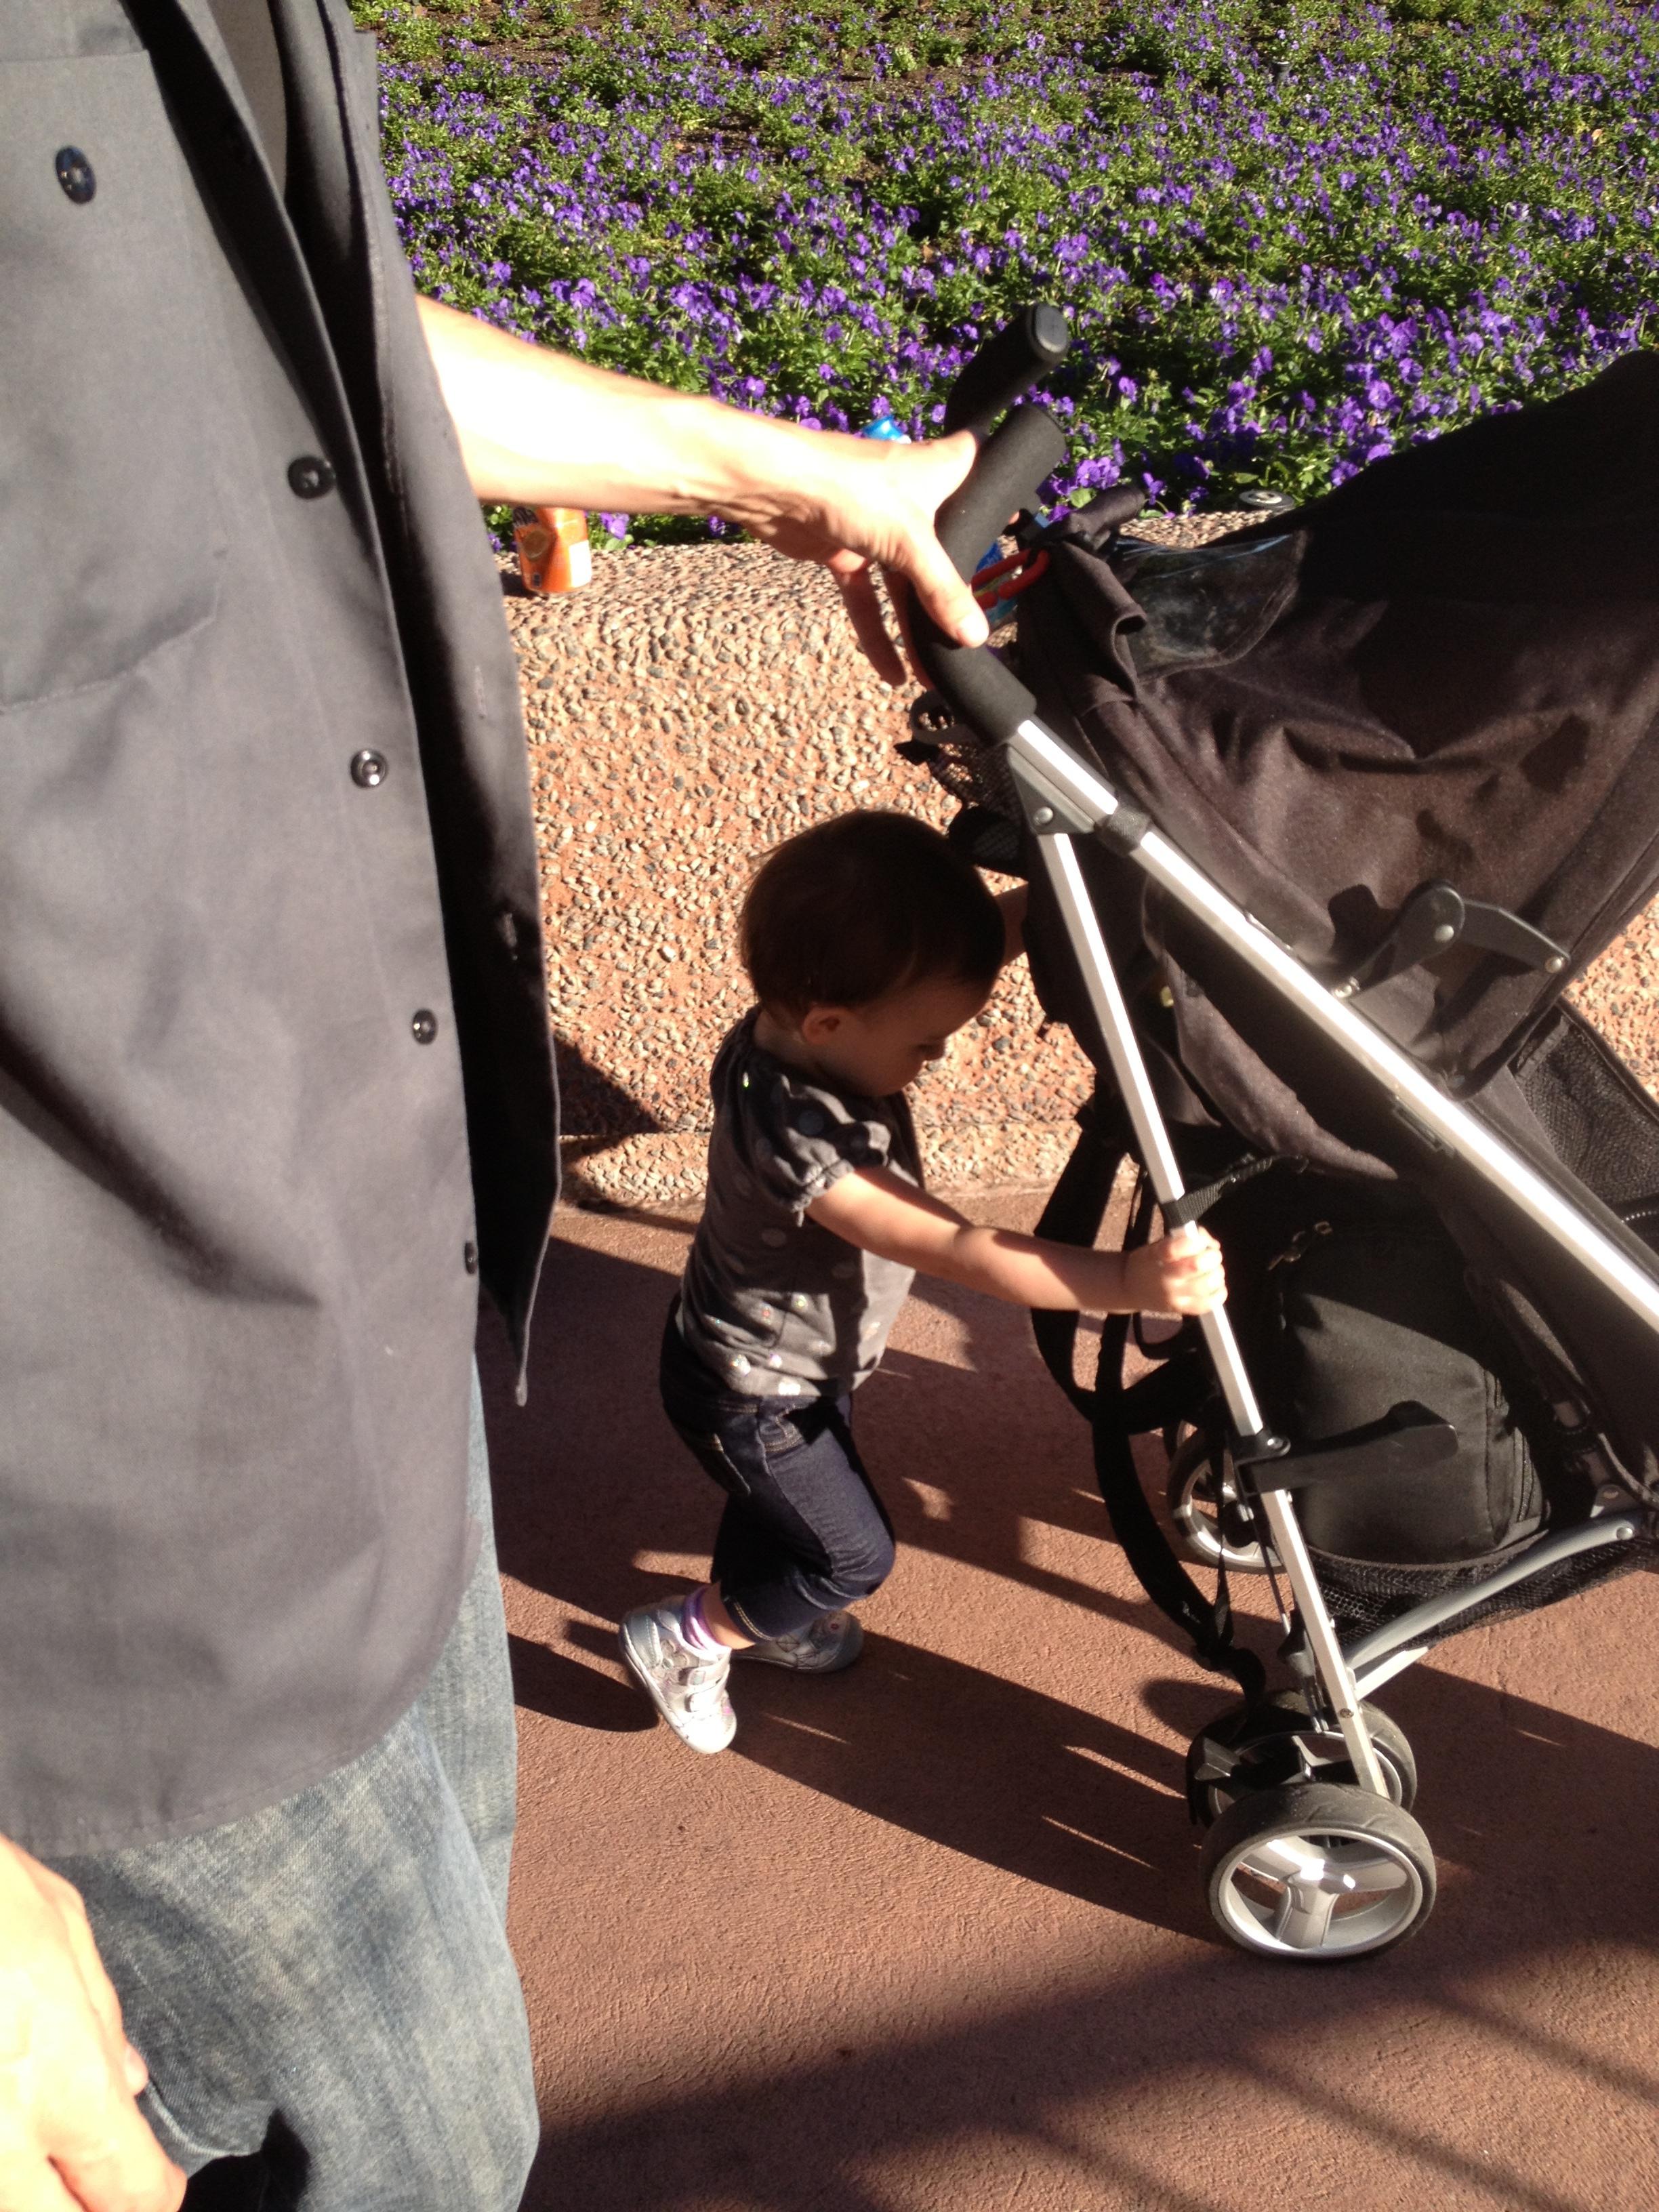 pushing her own stroller or nothing!